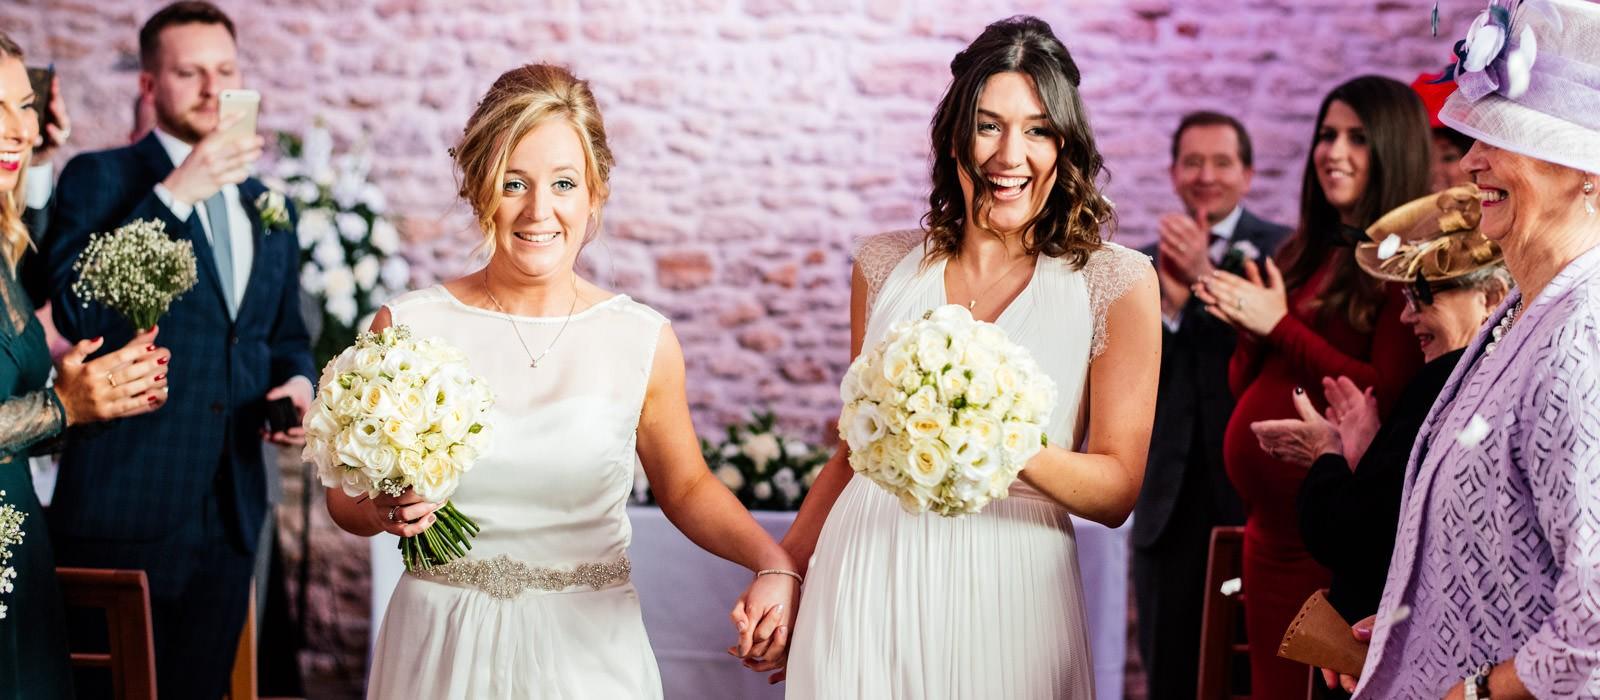 Same sex wedding-1001